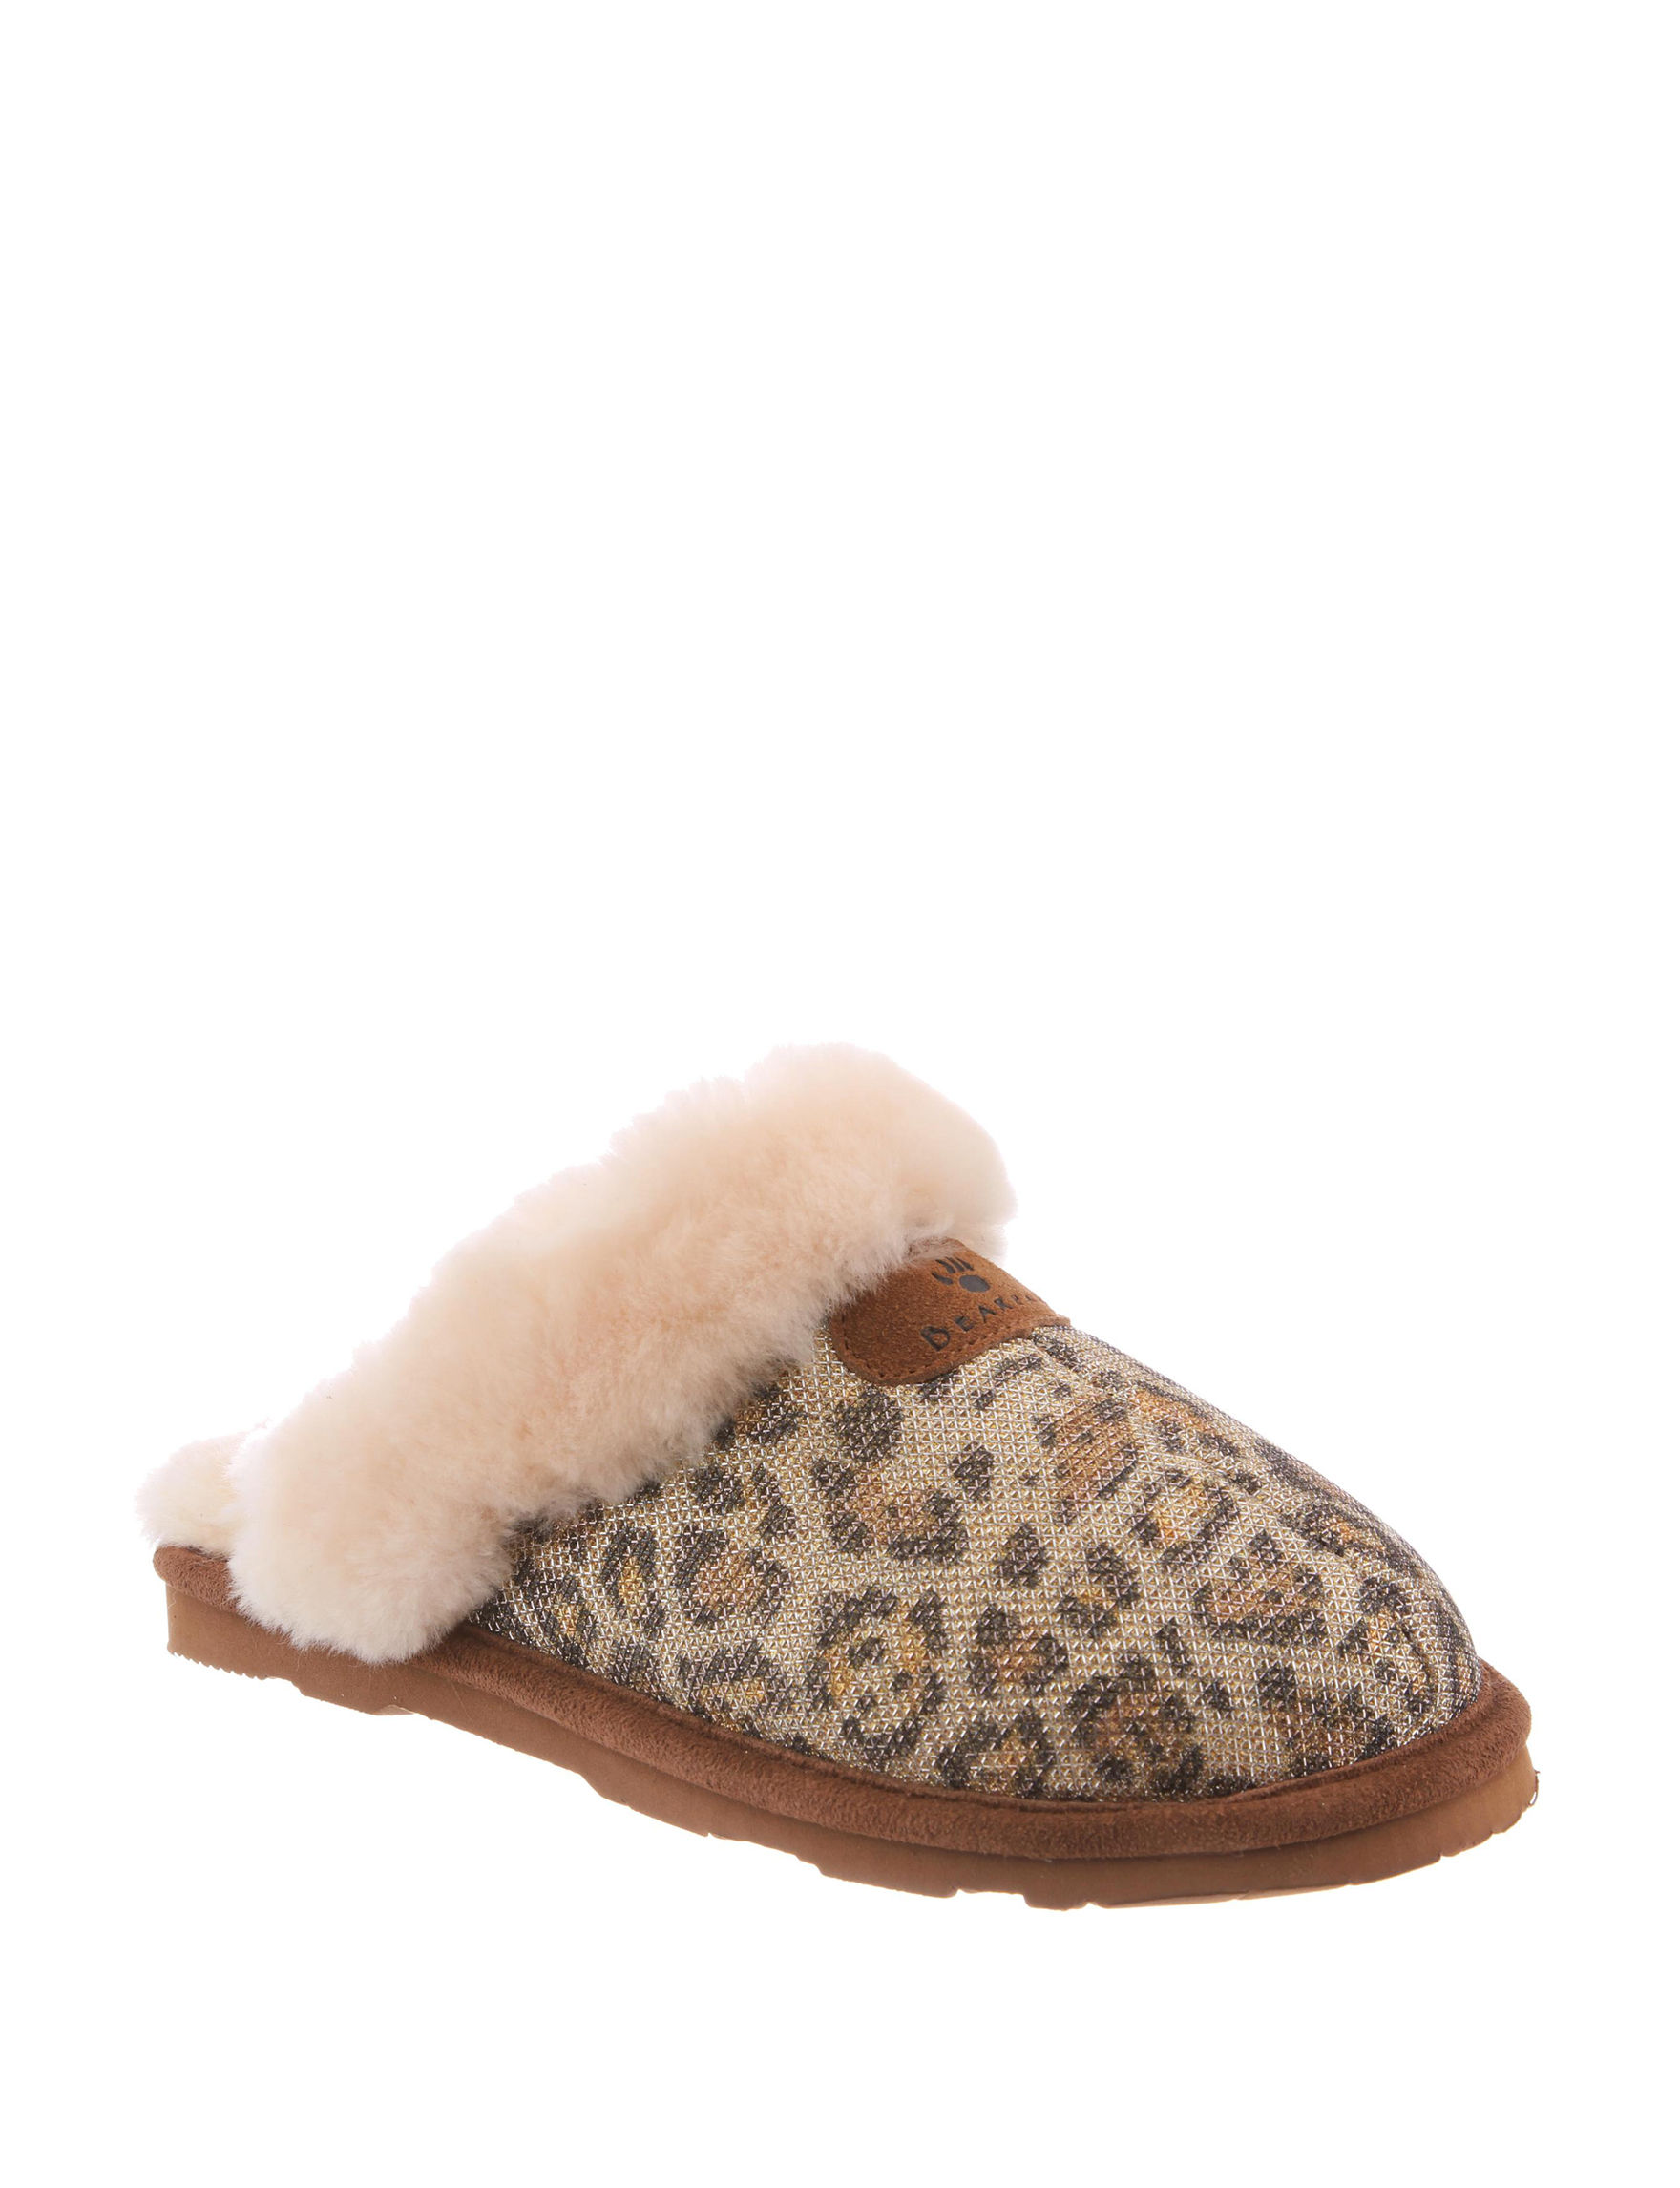 Bearpaw Gold Slipper Shoes